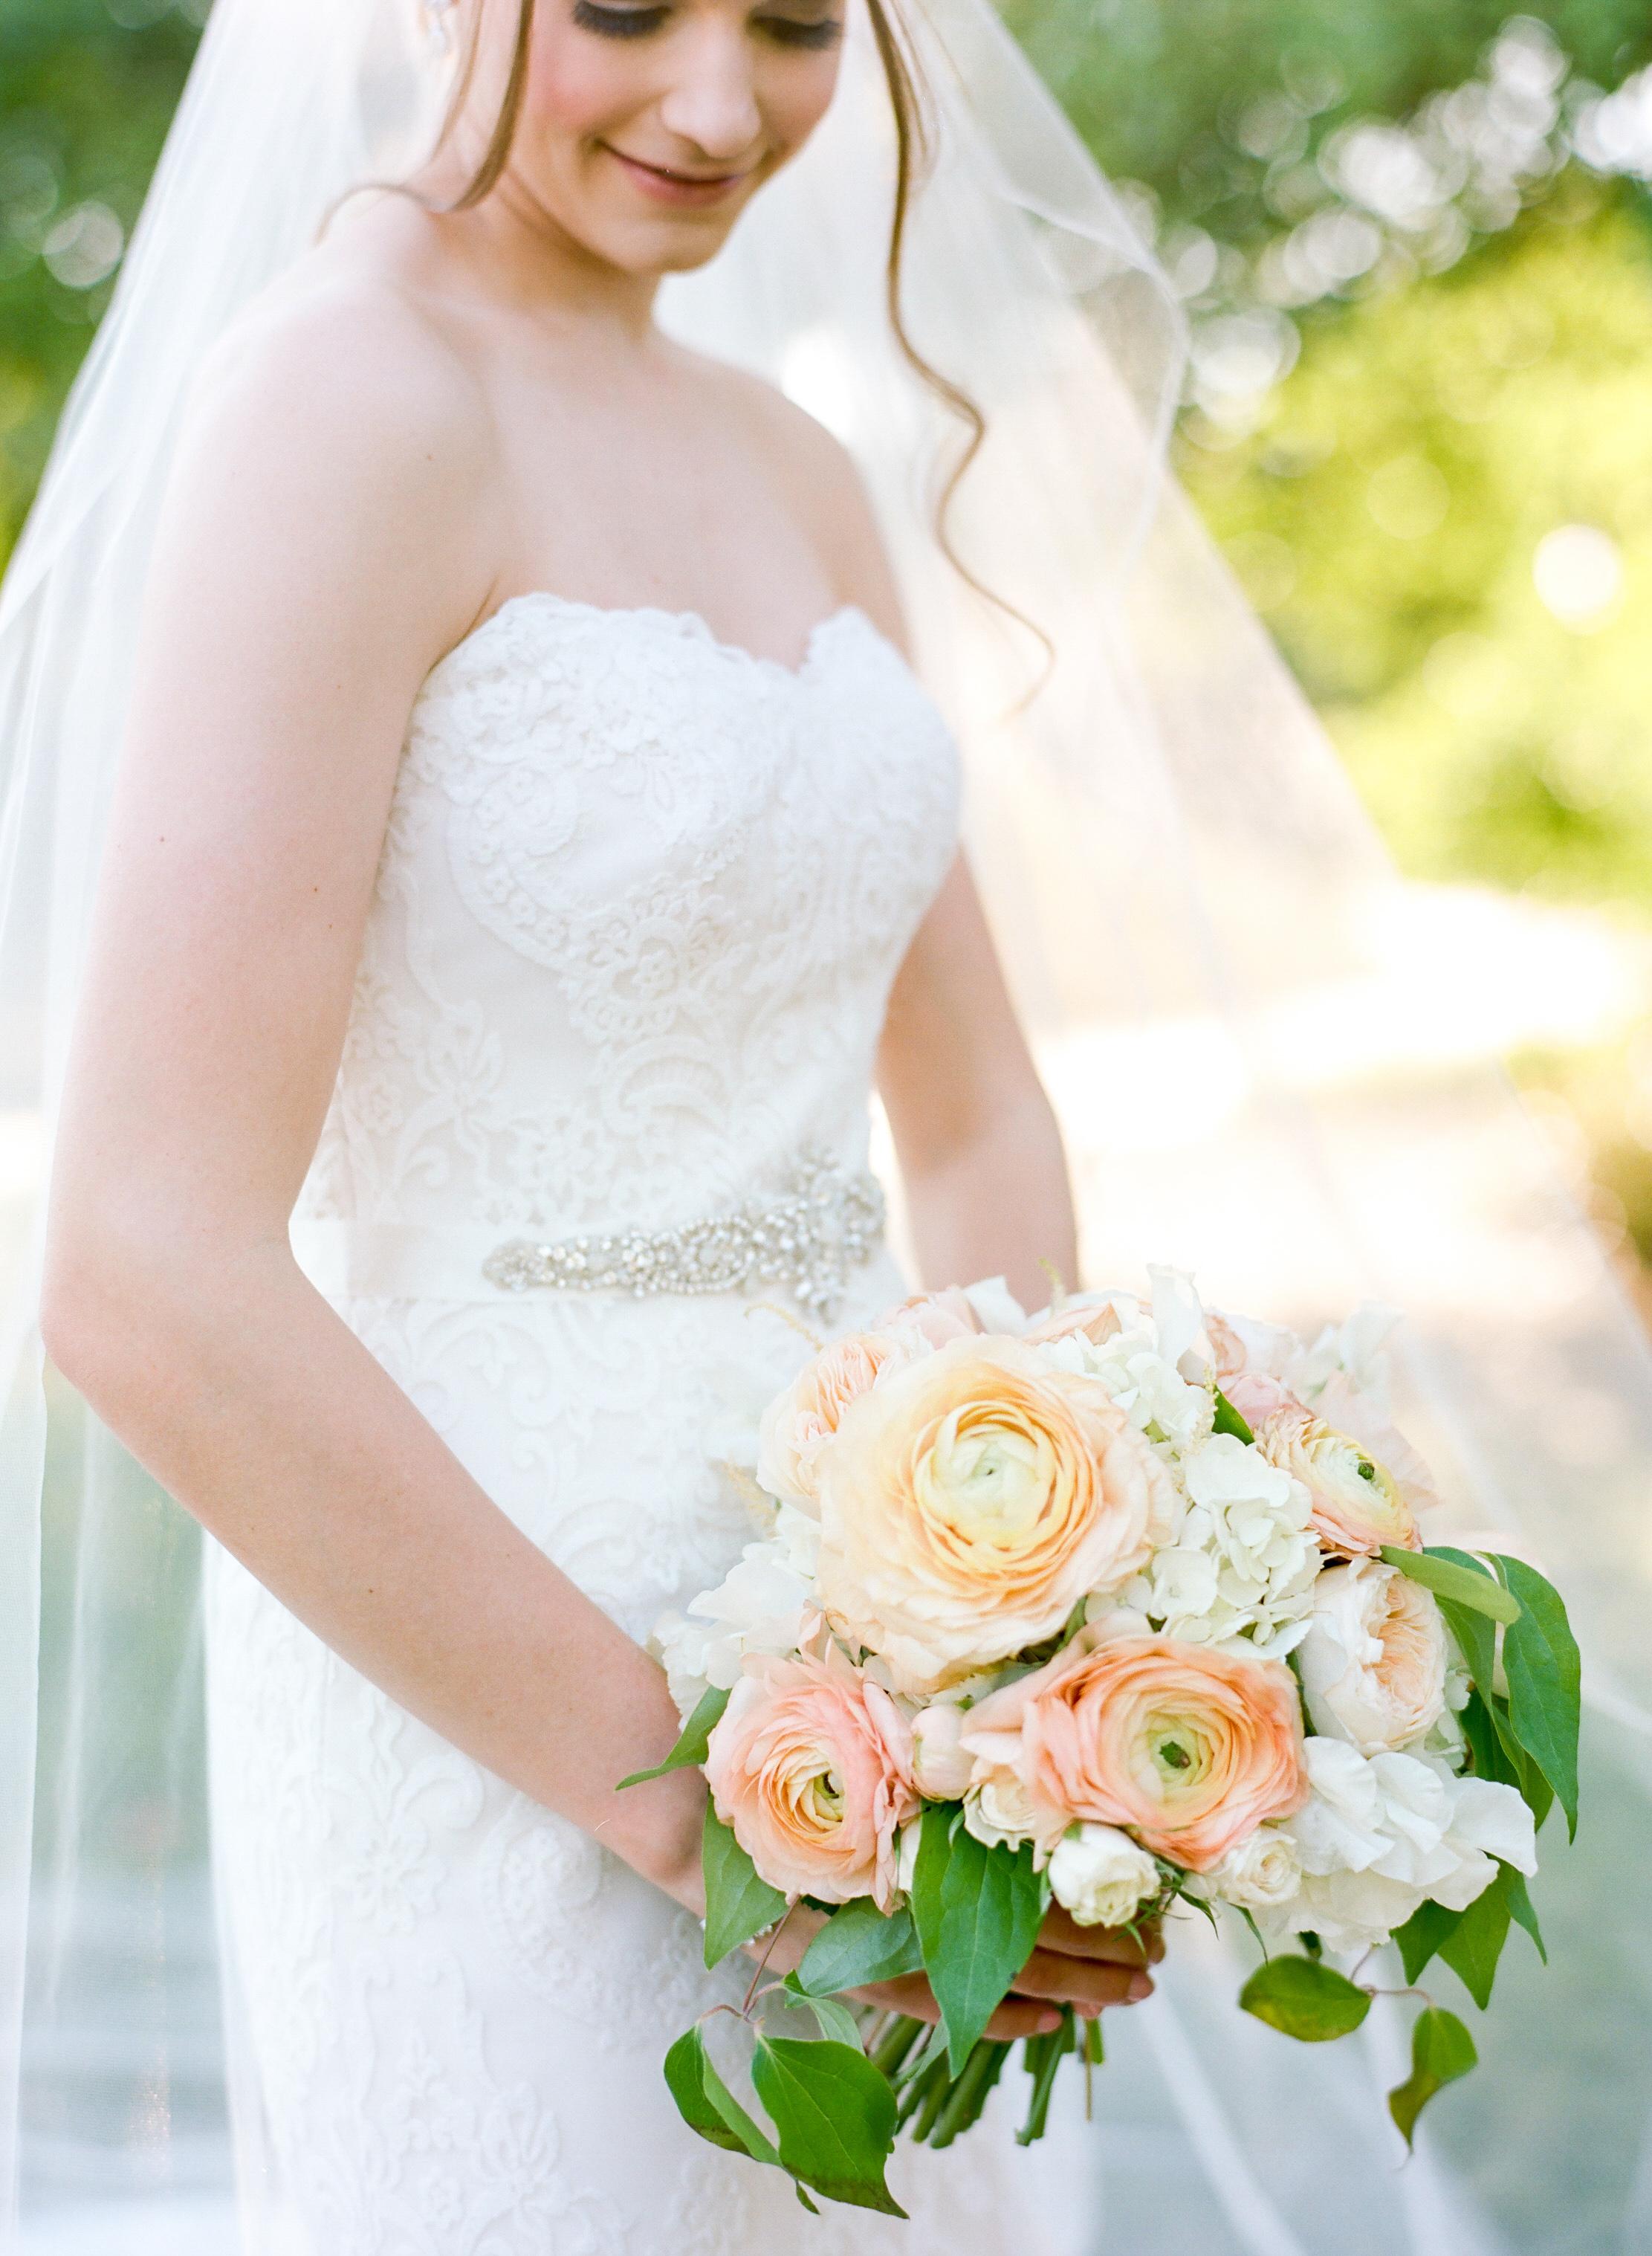 Houston-Wedding-Photographer-Film-Fine-Art-Bridals-Dana Fernandez-Photography-2.jpg